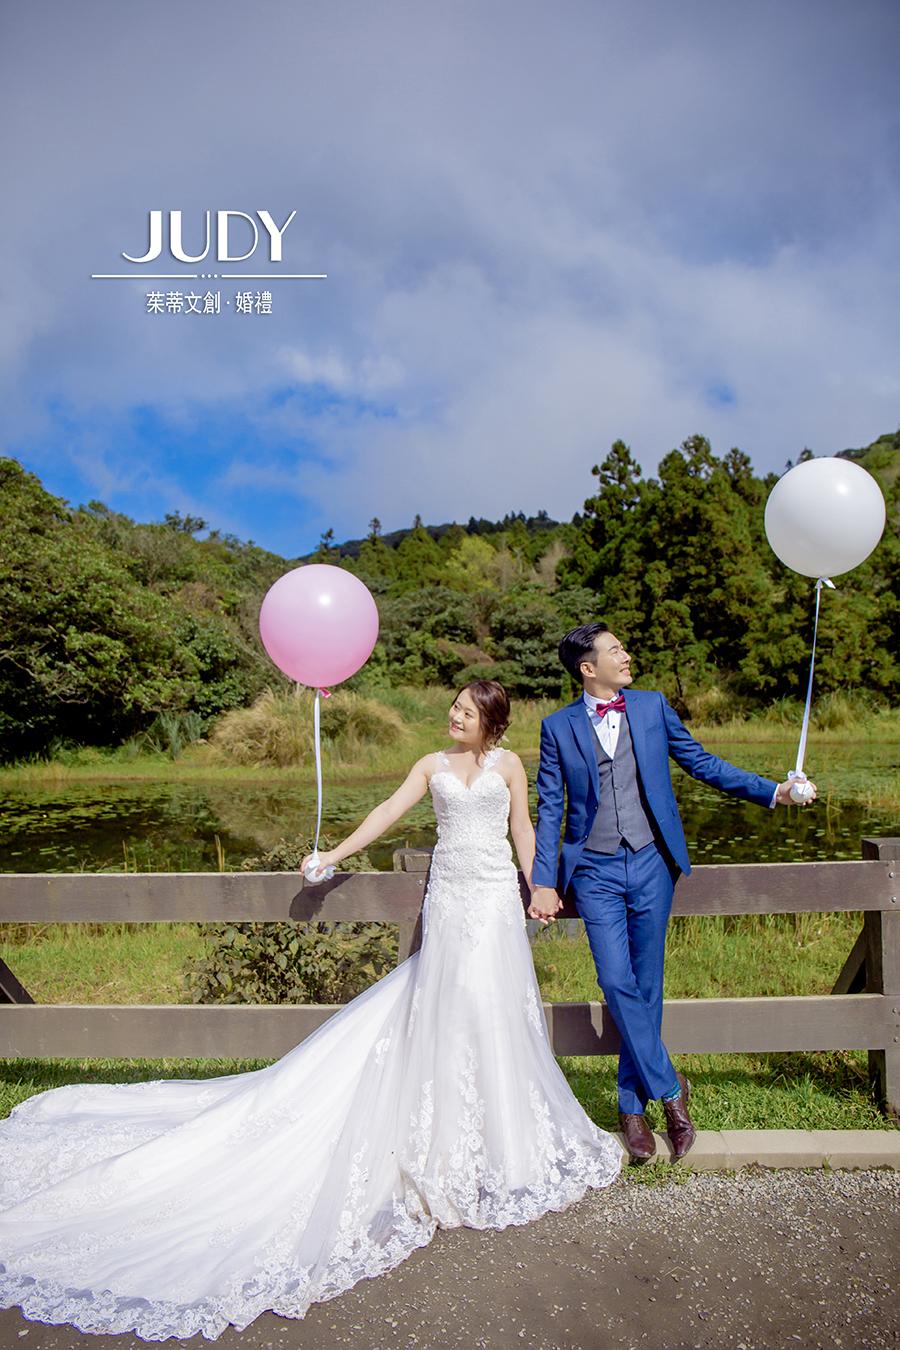 httpswww#婚紗攝影 #婚禮攝影 - 【Judy婚紗】茱蒂文創 · 婚禮《結婚吧》